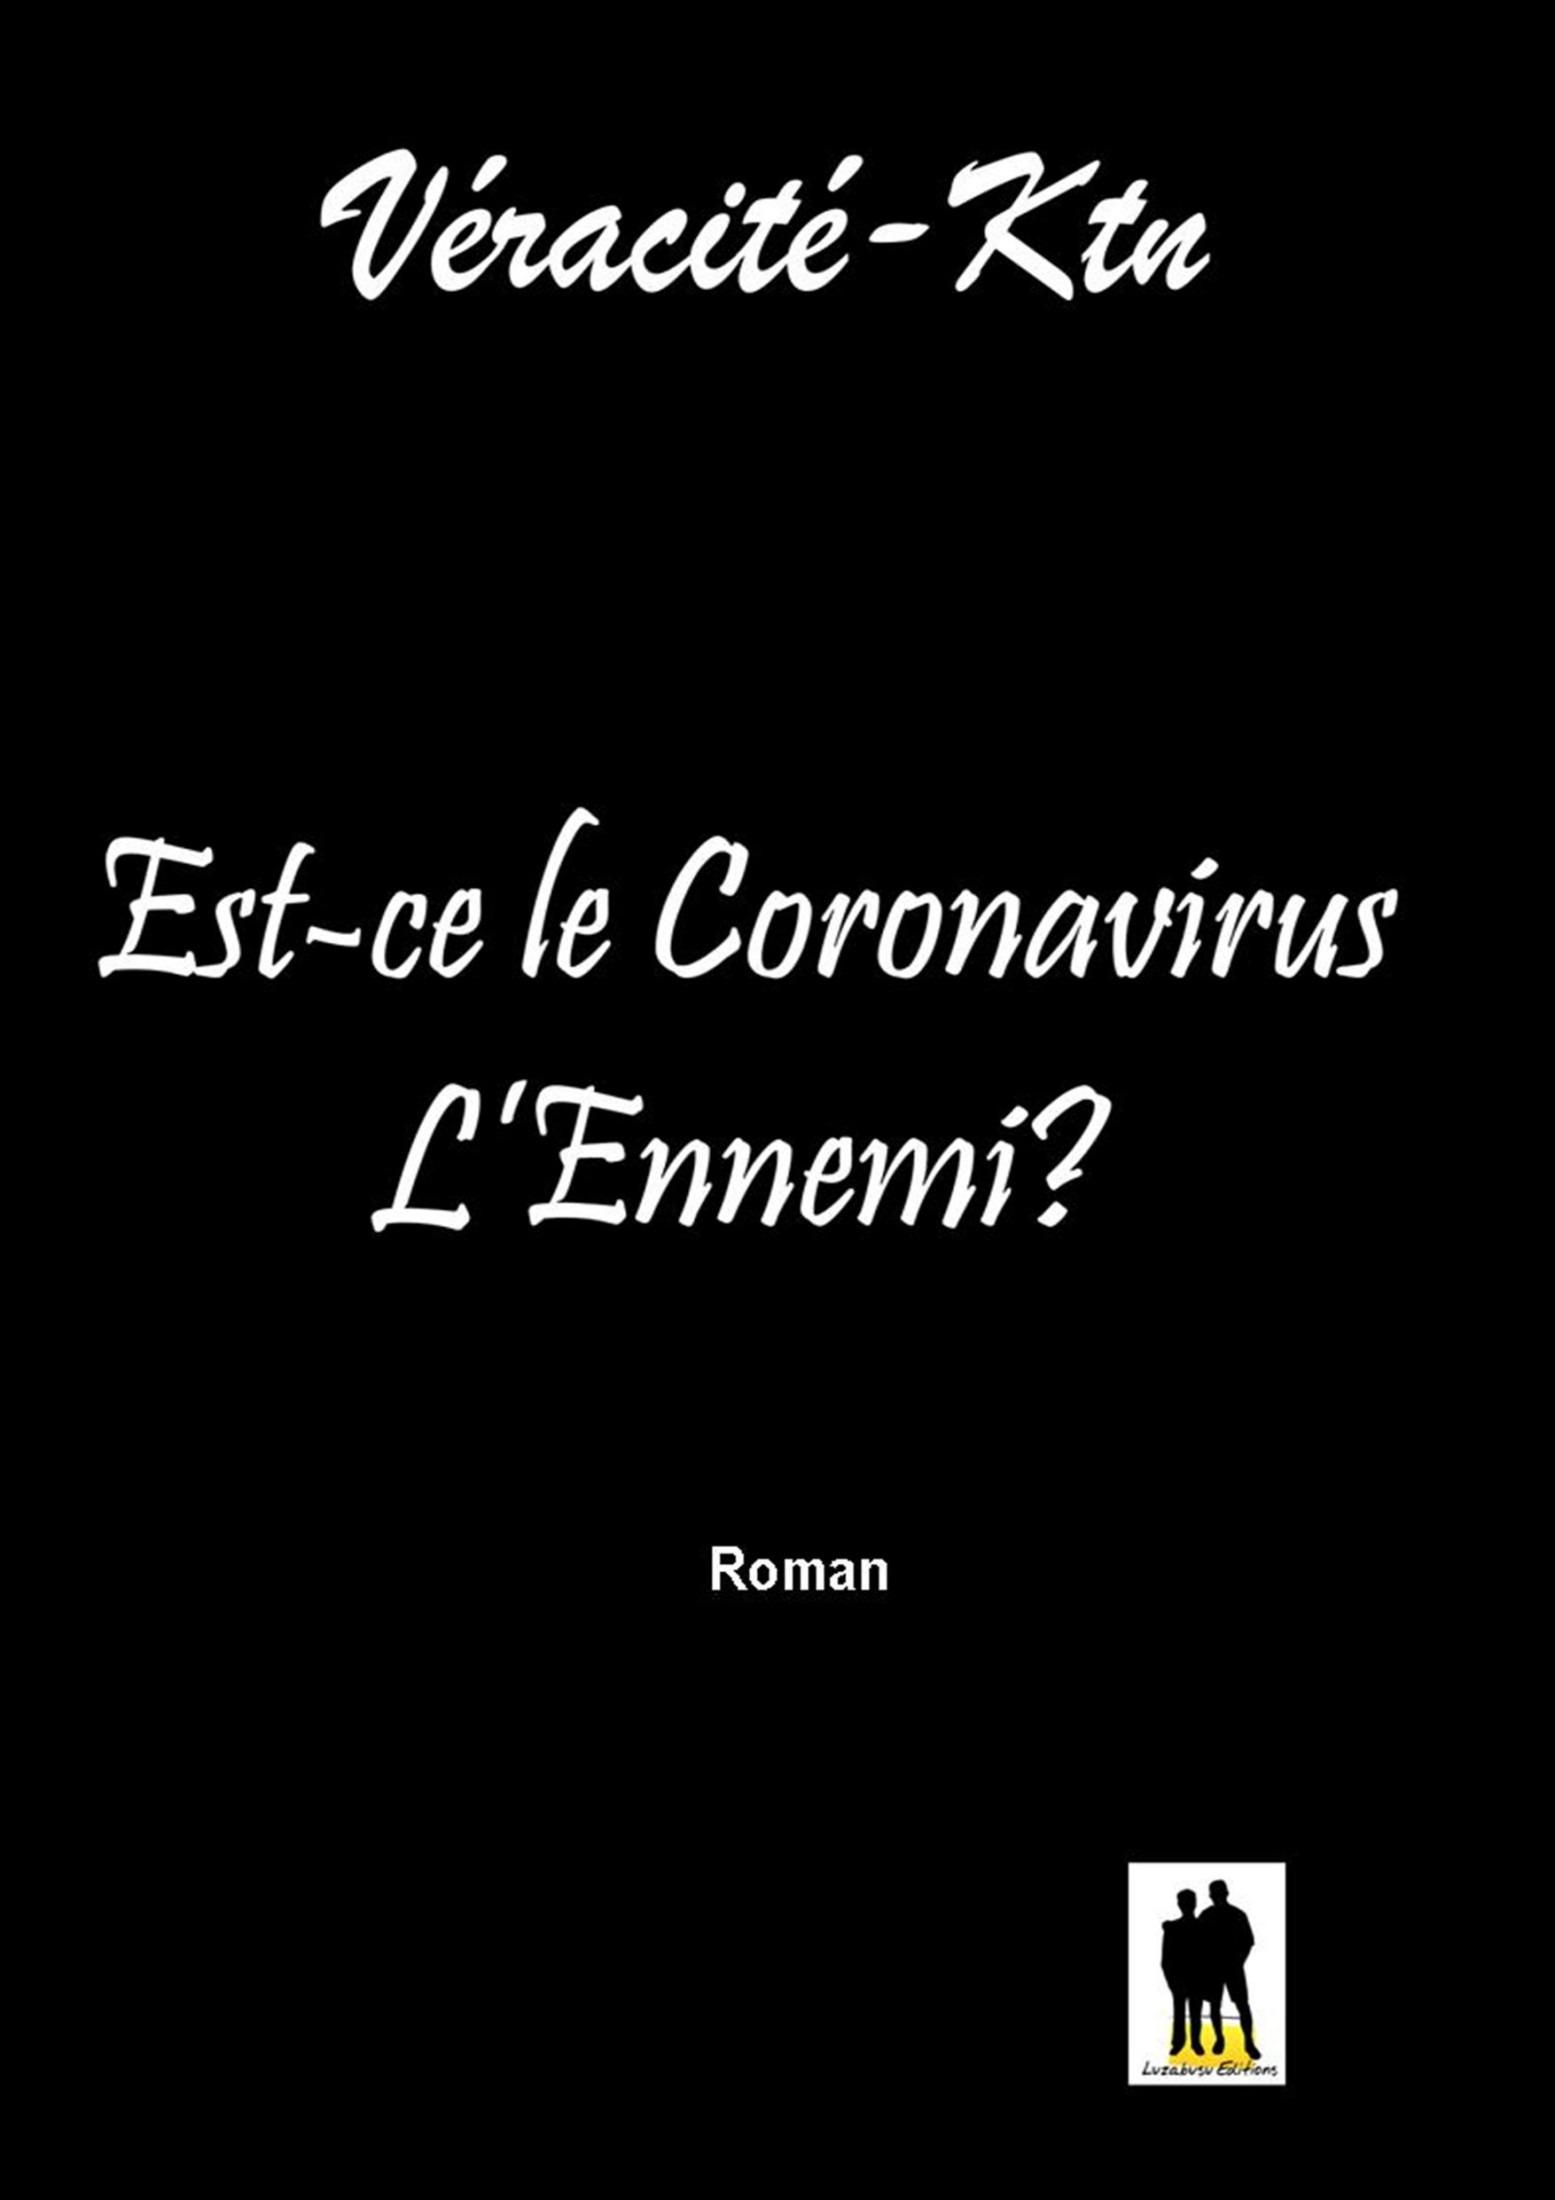 Est-ce le Coronavirus l'ennemi?